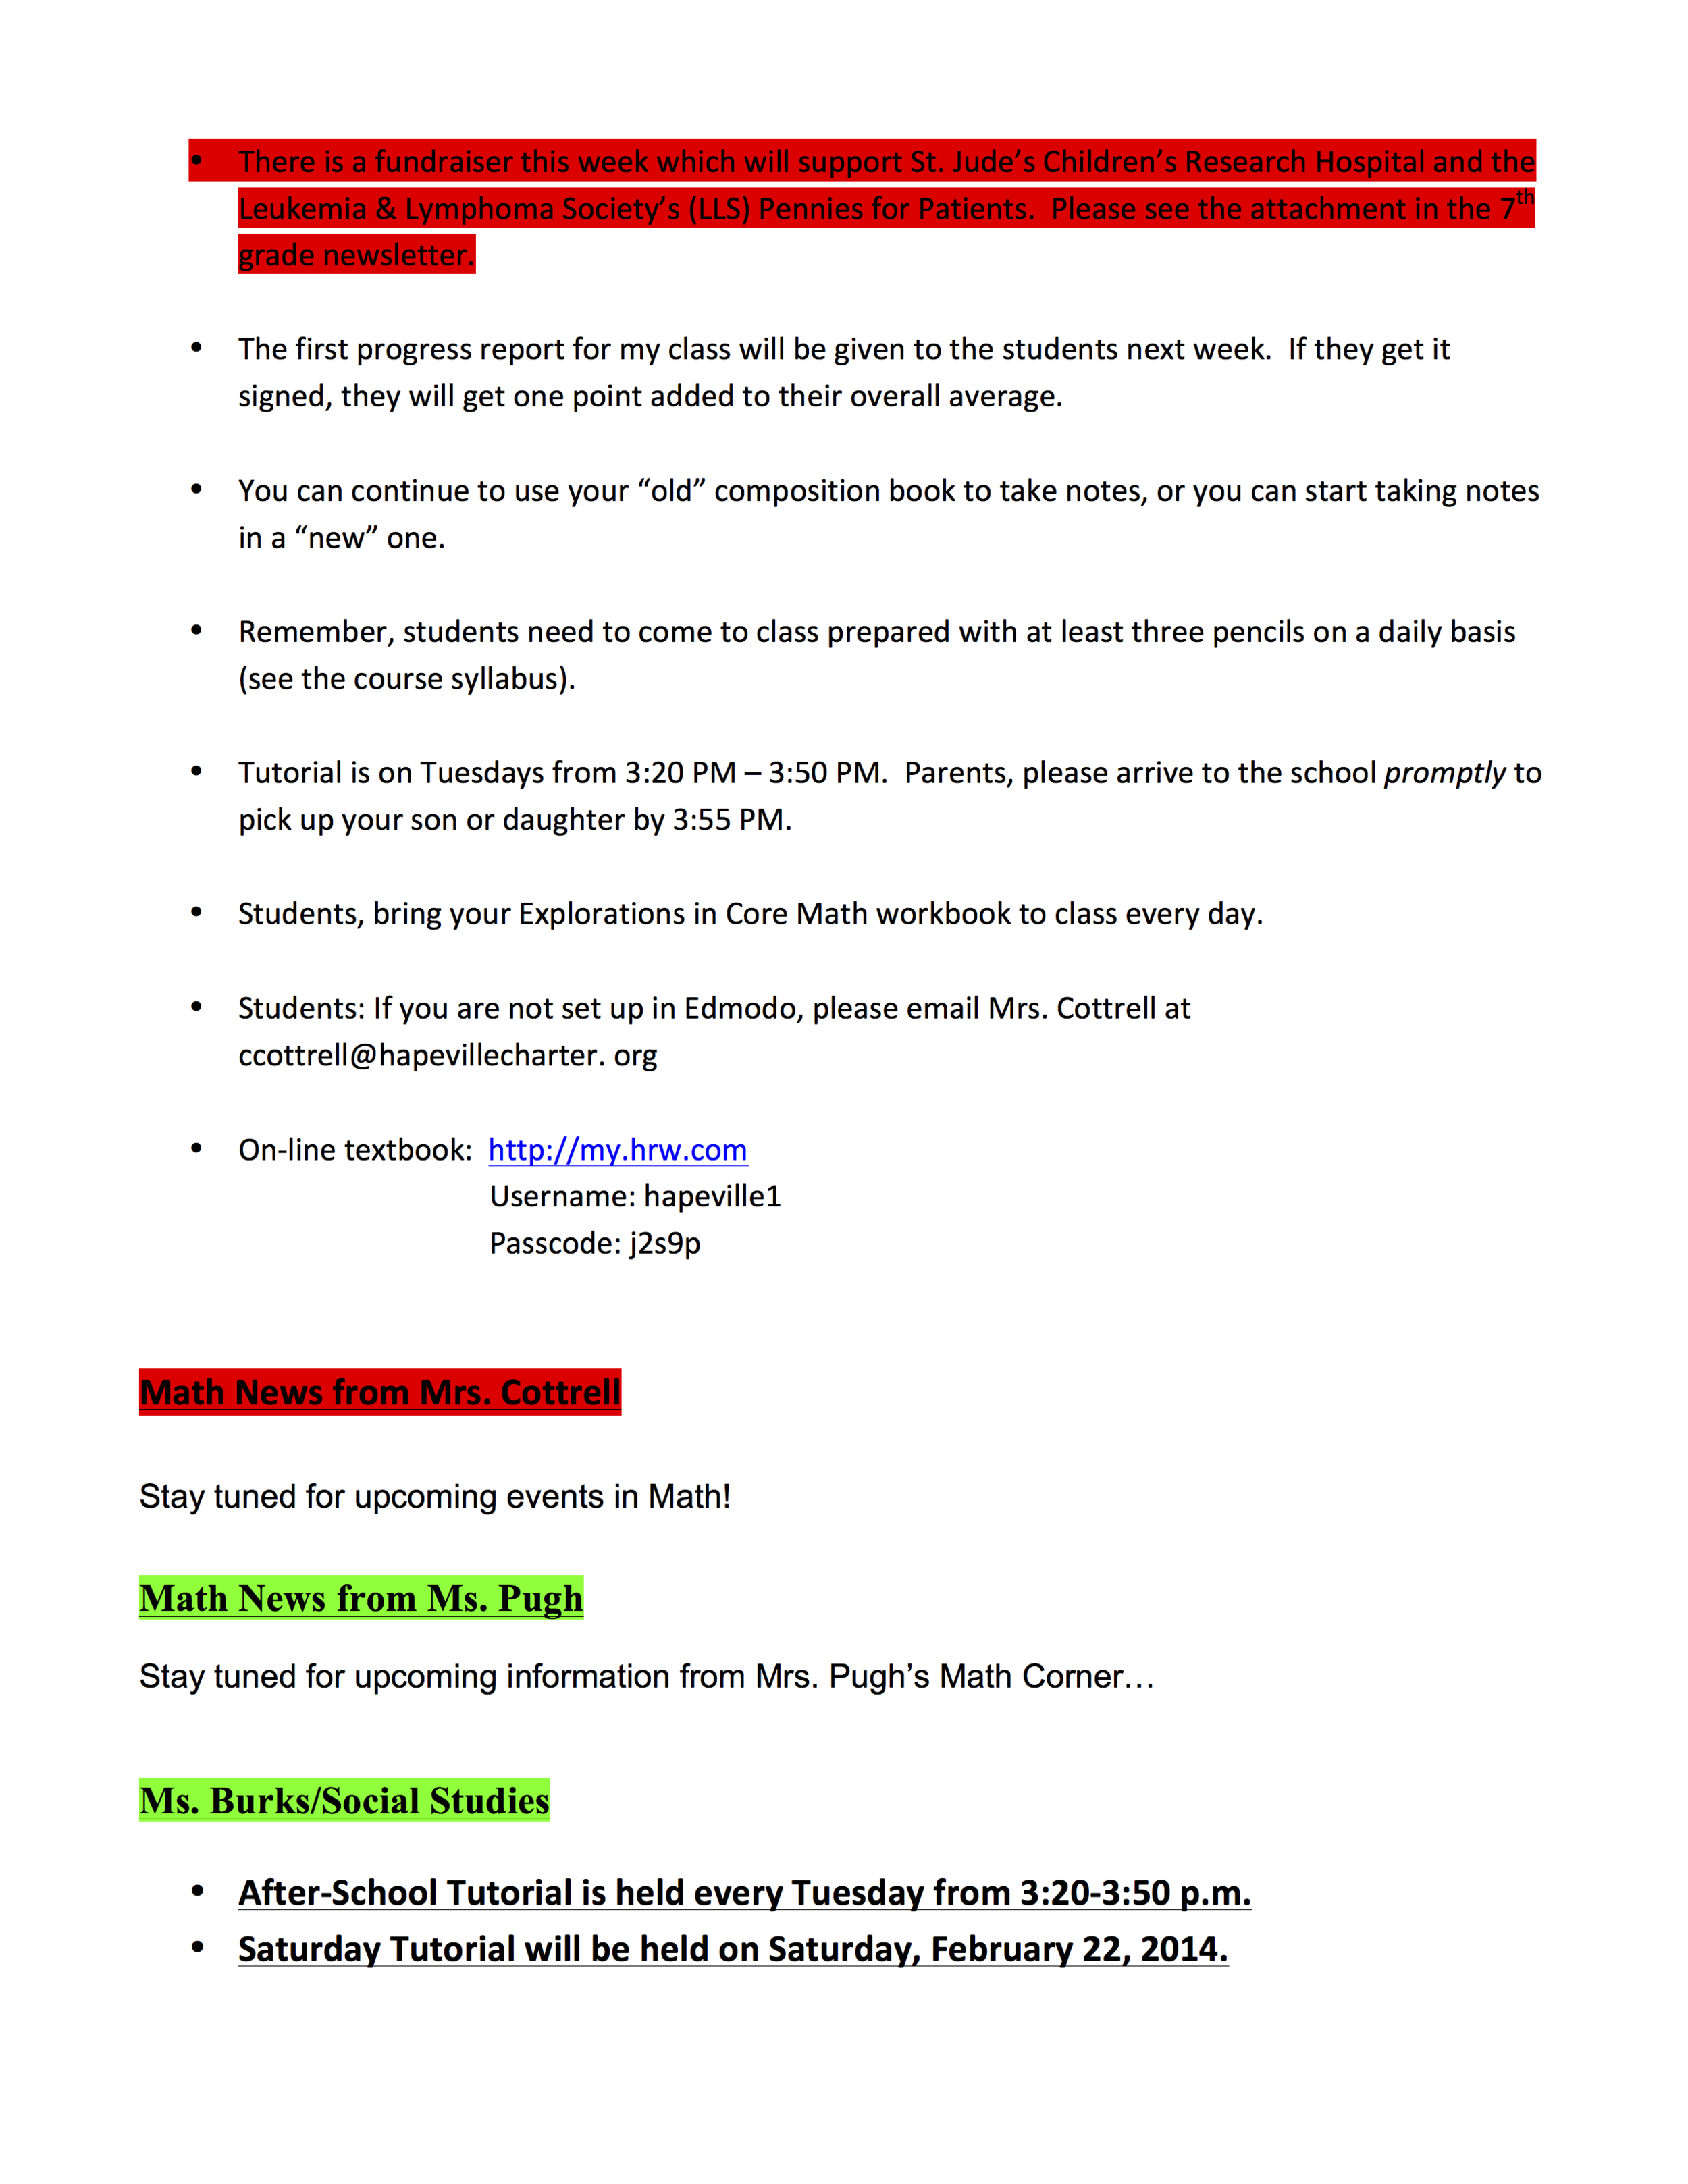 7th grade Newsletter Feb 10B.png